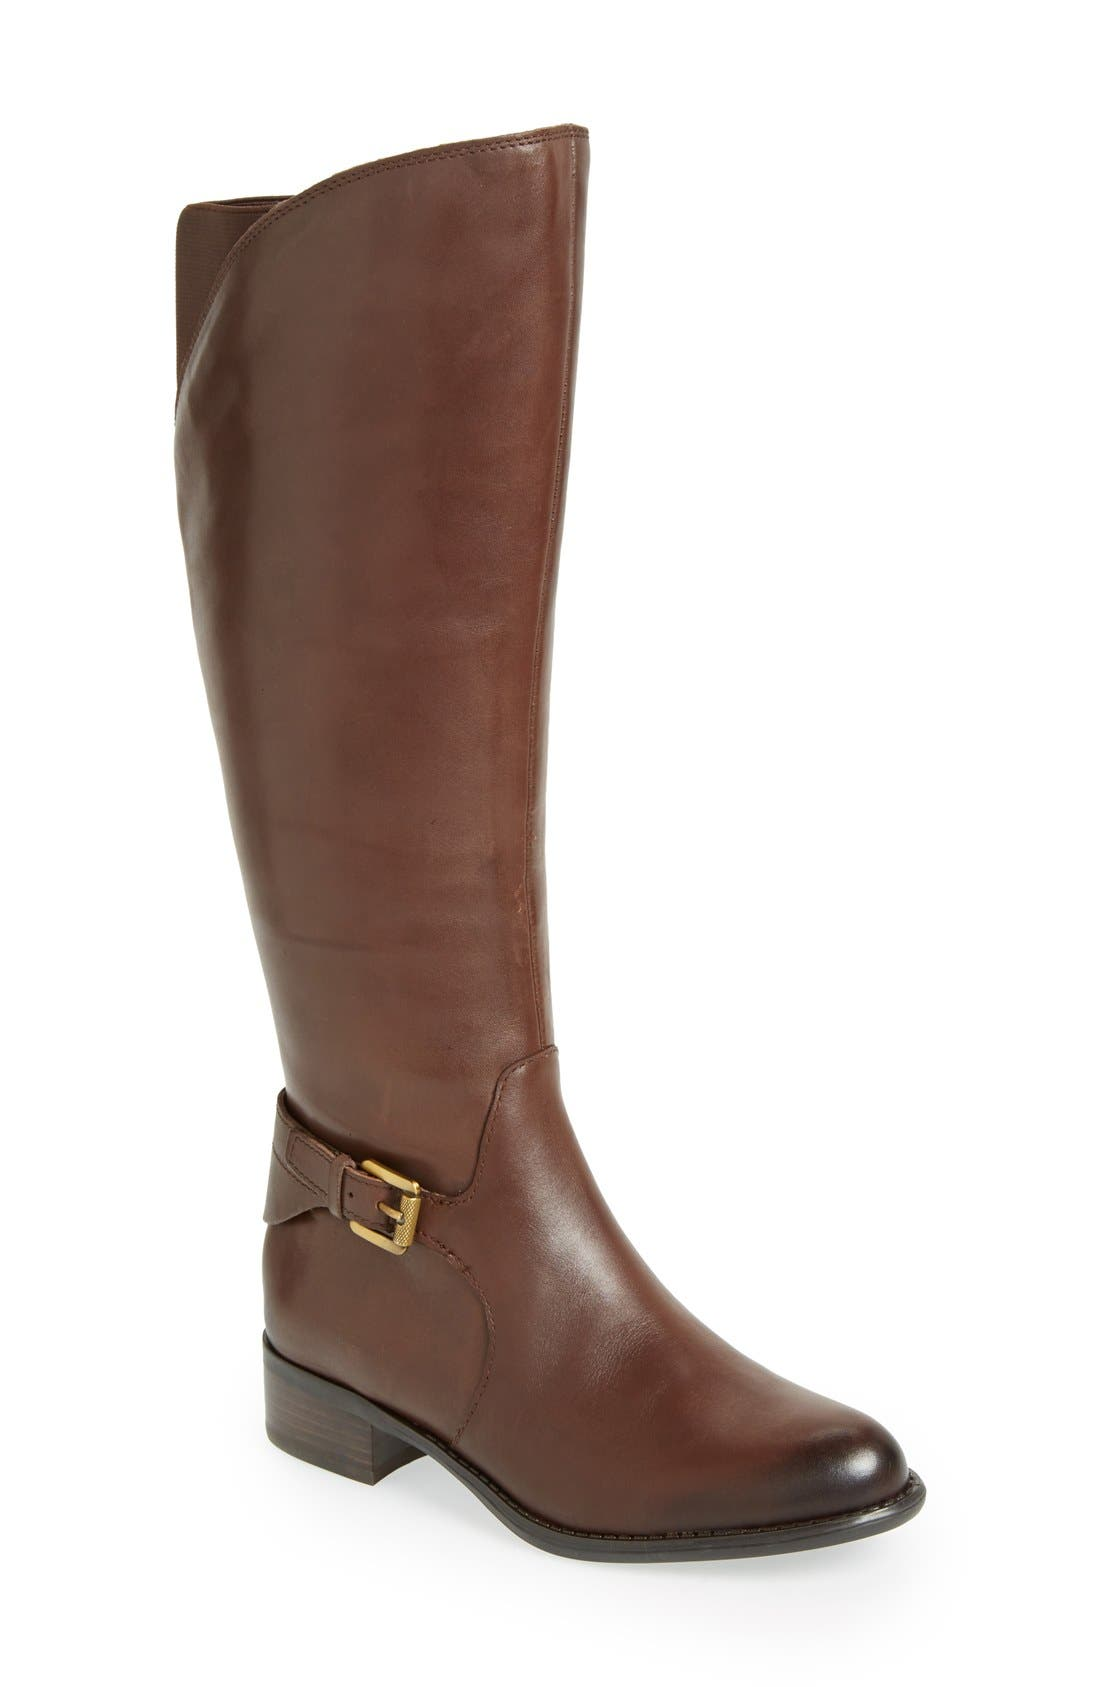 Main Image - Franco Sarto 'Craze' Knee High Leather Boot (Women)